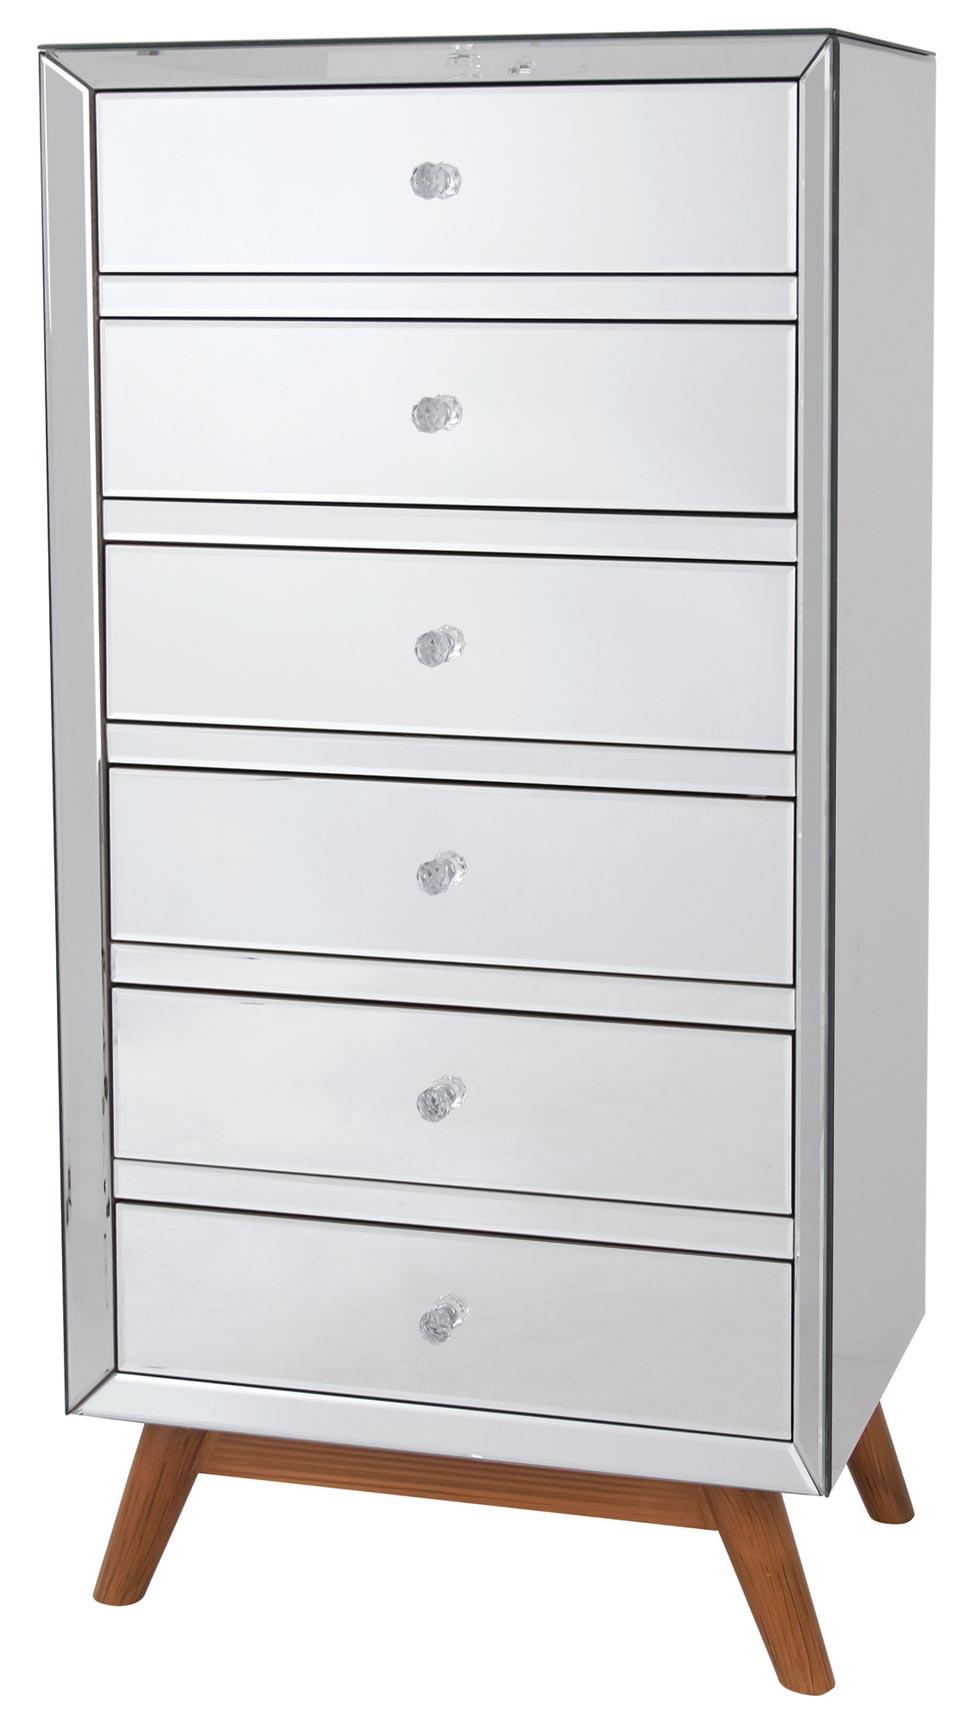 commode miroir sur m dium finition fr ne trocad ro r f 16030443. Black Bedroom Furniture Sets. Home Design Ideas